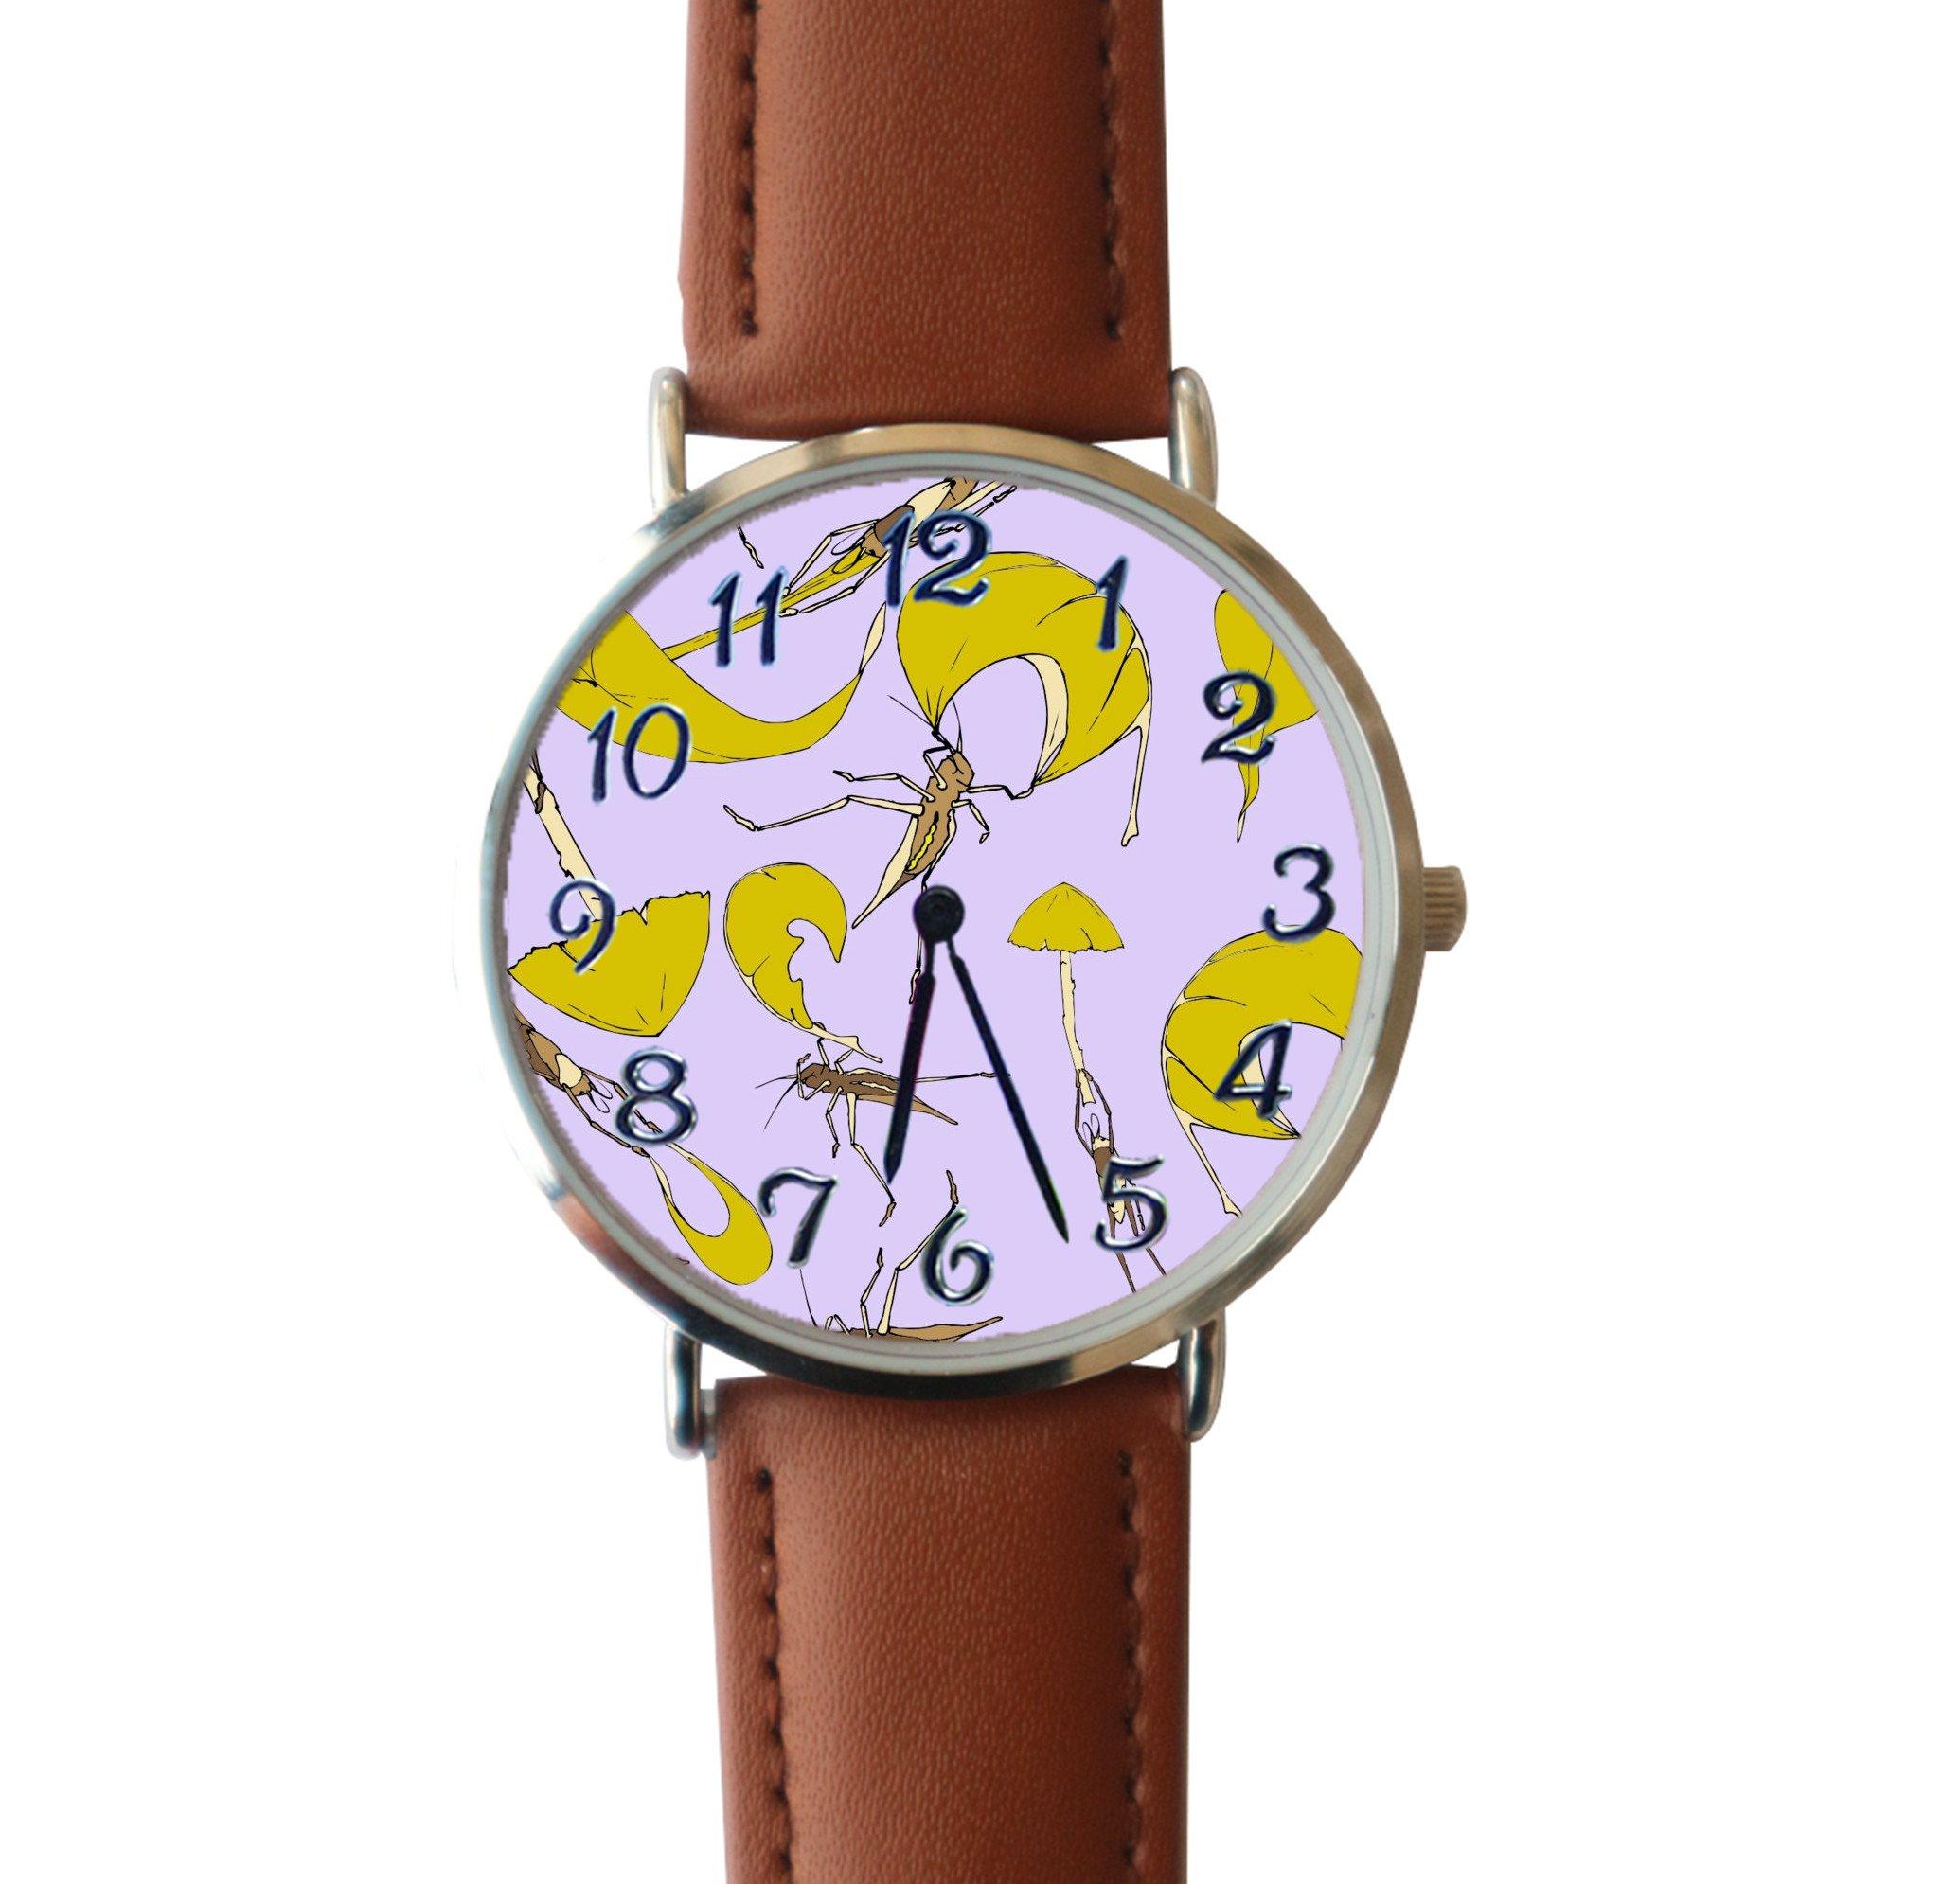 JISJJCKJSX Grasshopper custom watches quartz watch stainless steel case